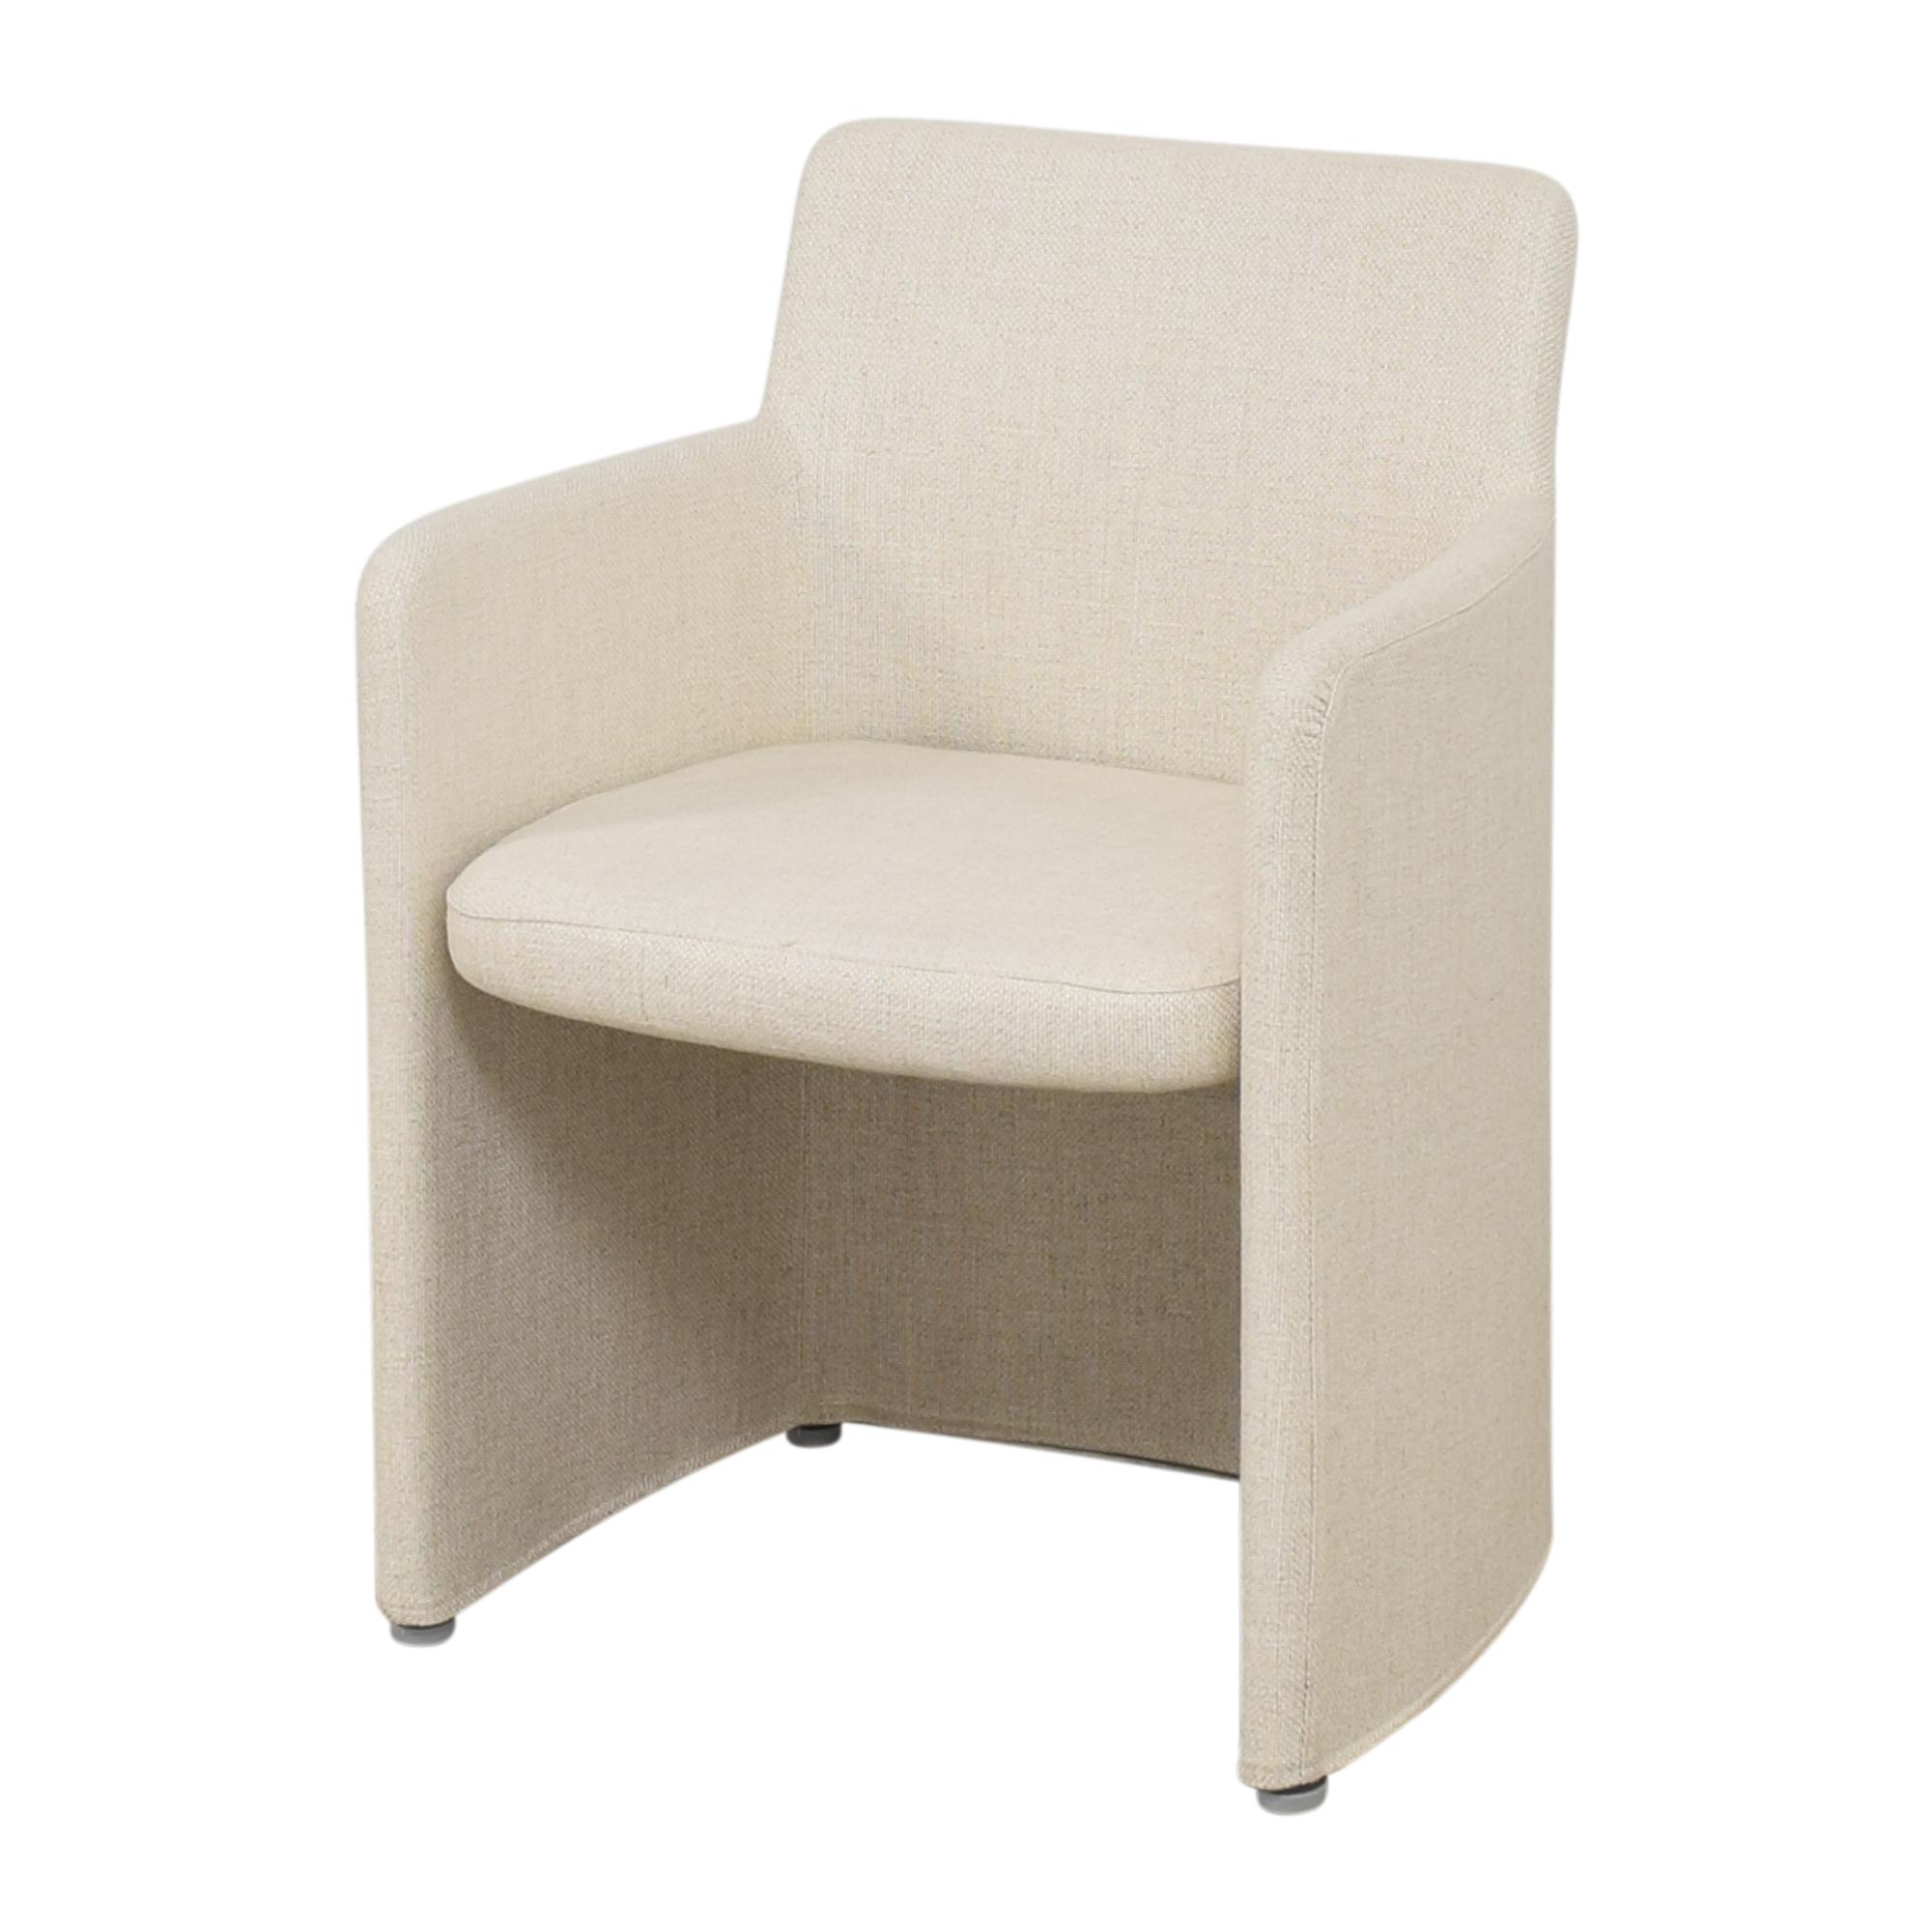 Casamilano Casamilano Clivia Chair beige